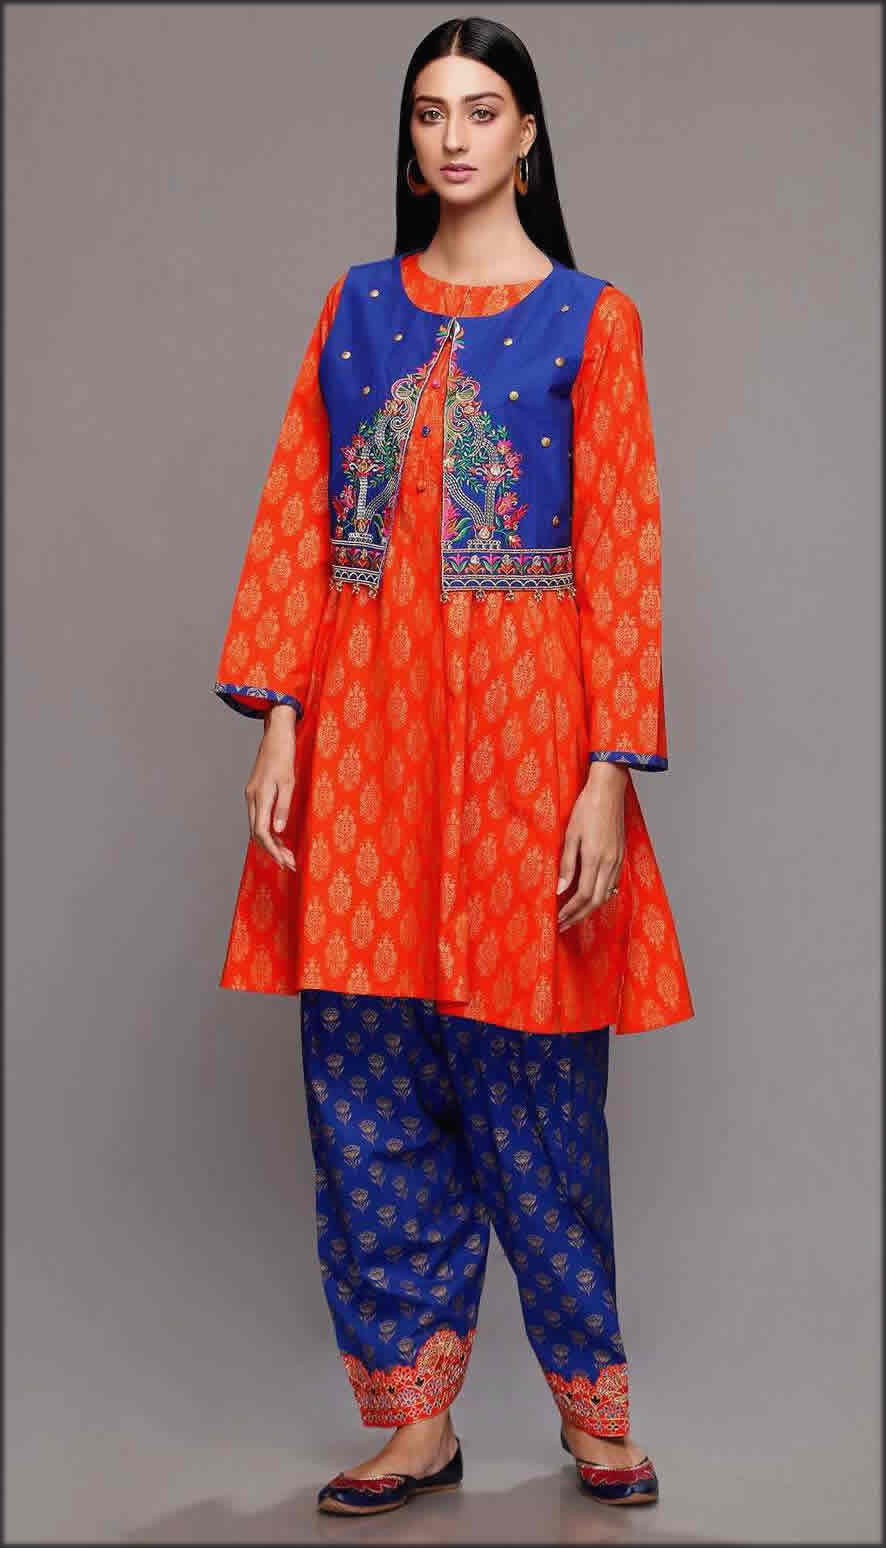 Blue Peacock Orange Frock And Koti Rang Ja Summer Collection